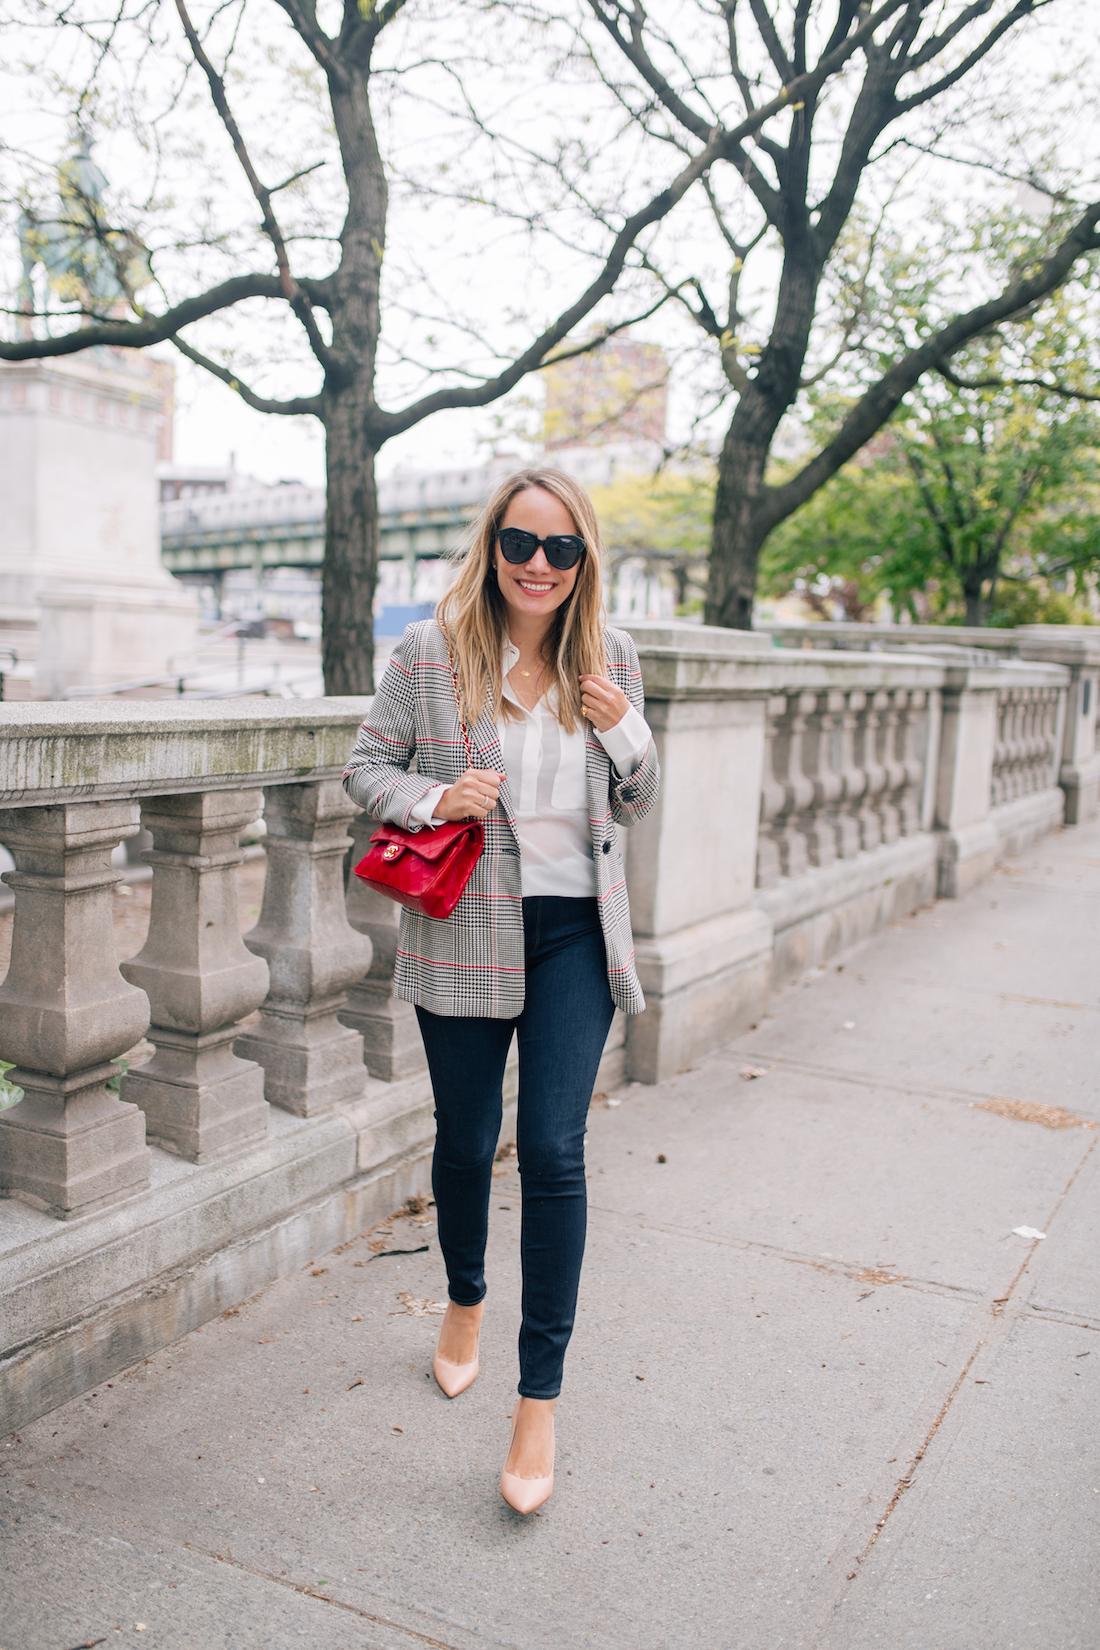 Grace Atwood's Outfit Details: Anine Bing Blazer // gifted INSPR top // Paige Jeans // Chanel Red Bag (Vintage) // Sarah Flint Heels // Karen Walker Sunglasses